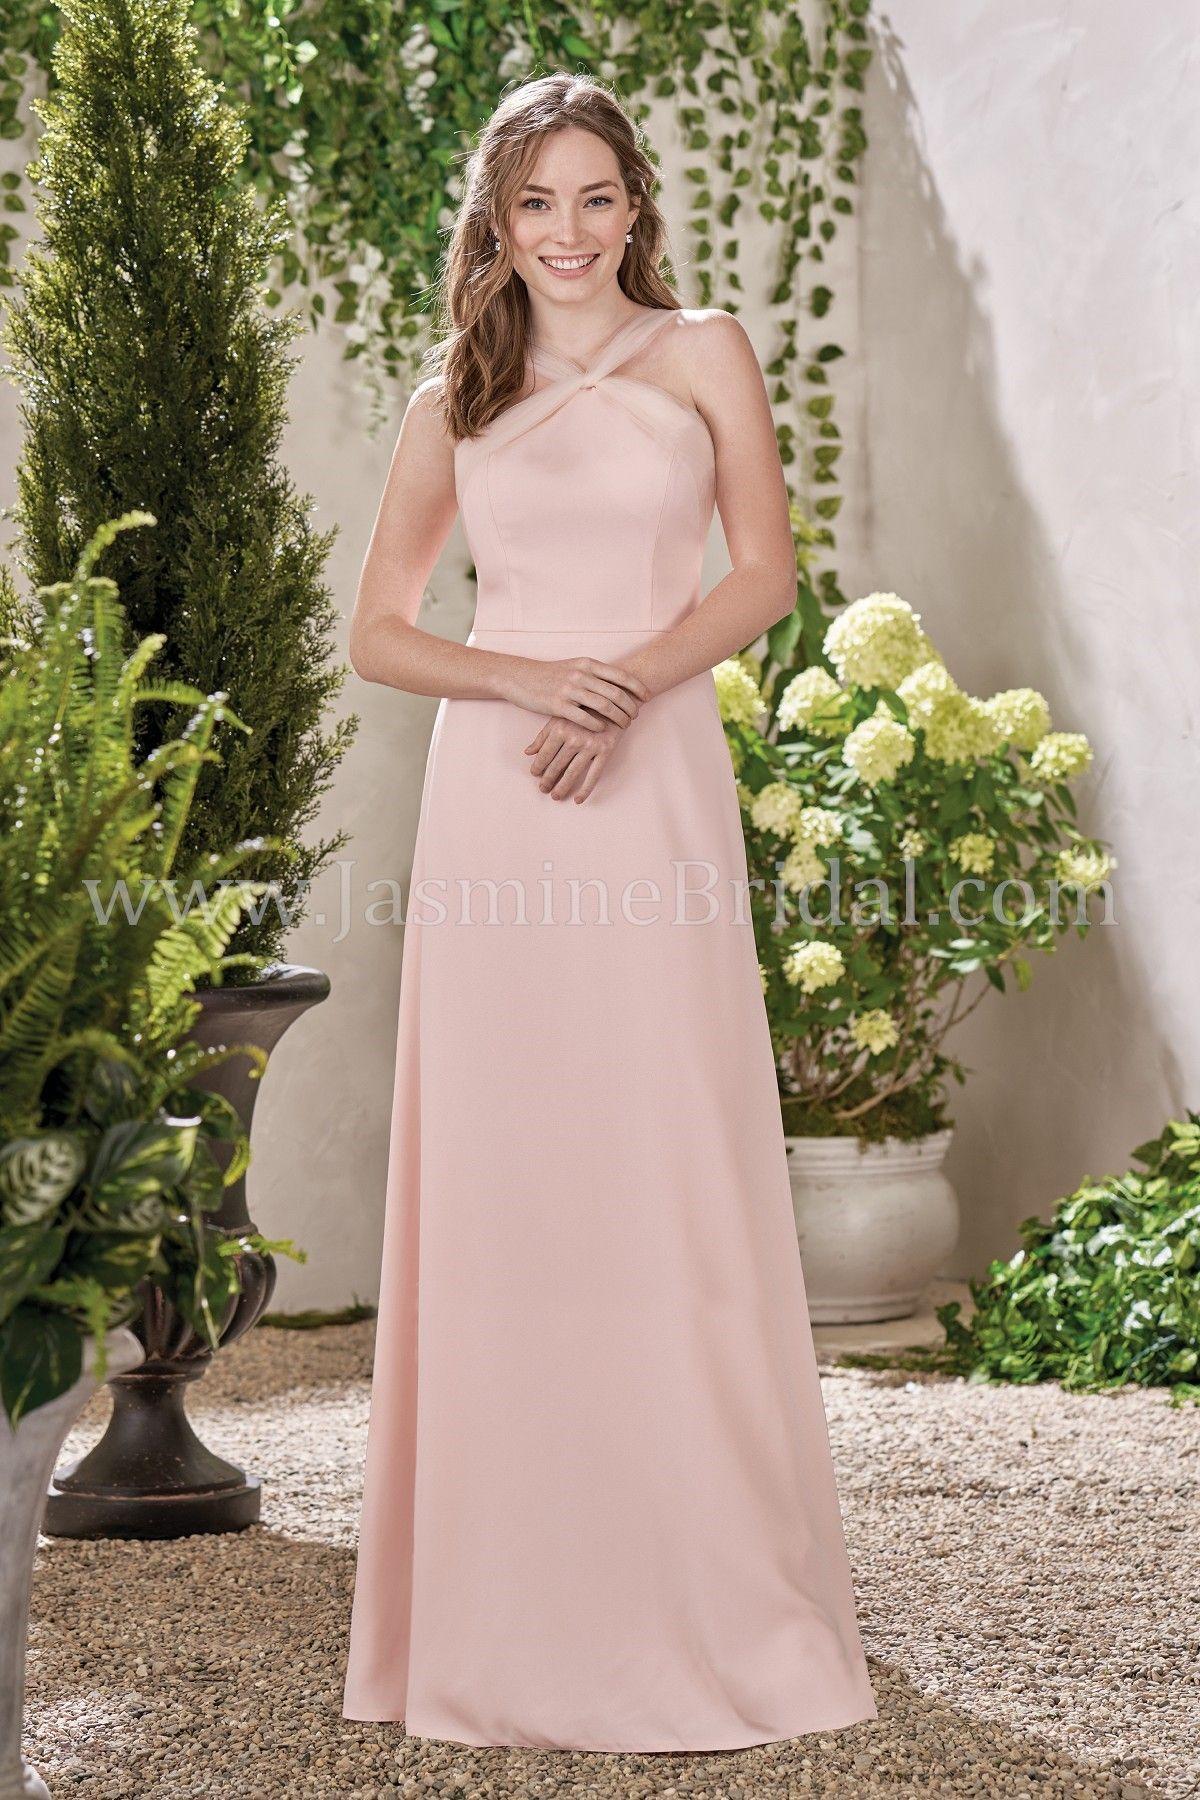 bcfb14723eb Bridesmaid Dresses Jasmine B2 - Gomes Weine AG